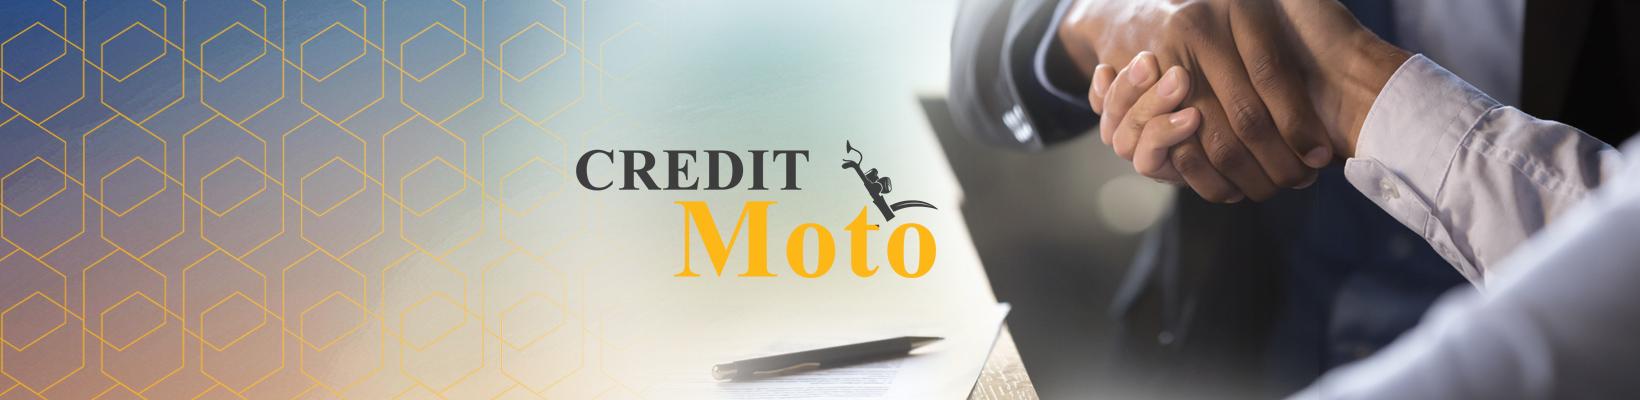 1640x400-credit-moto